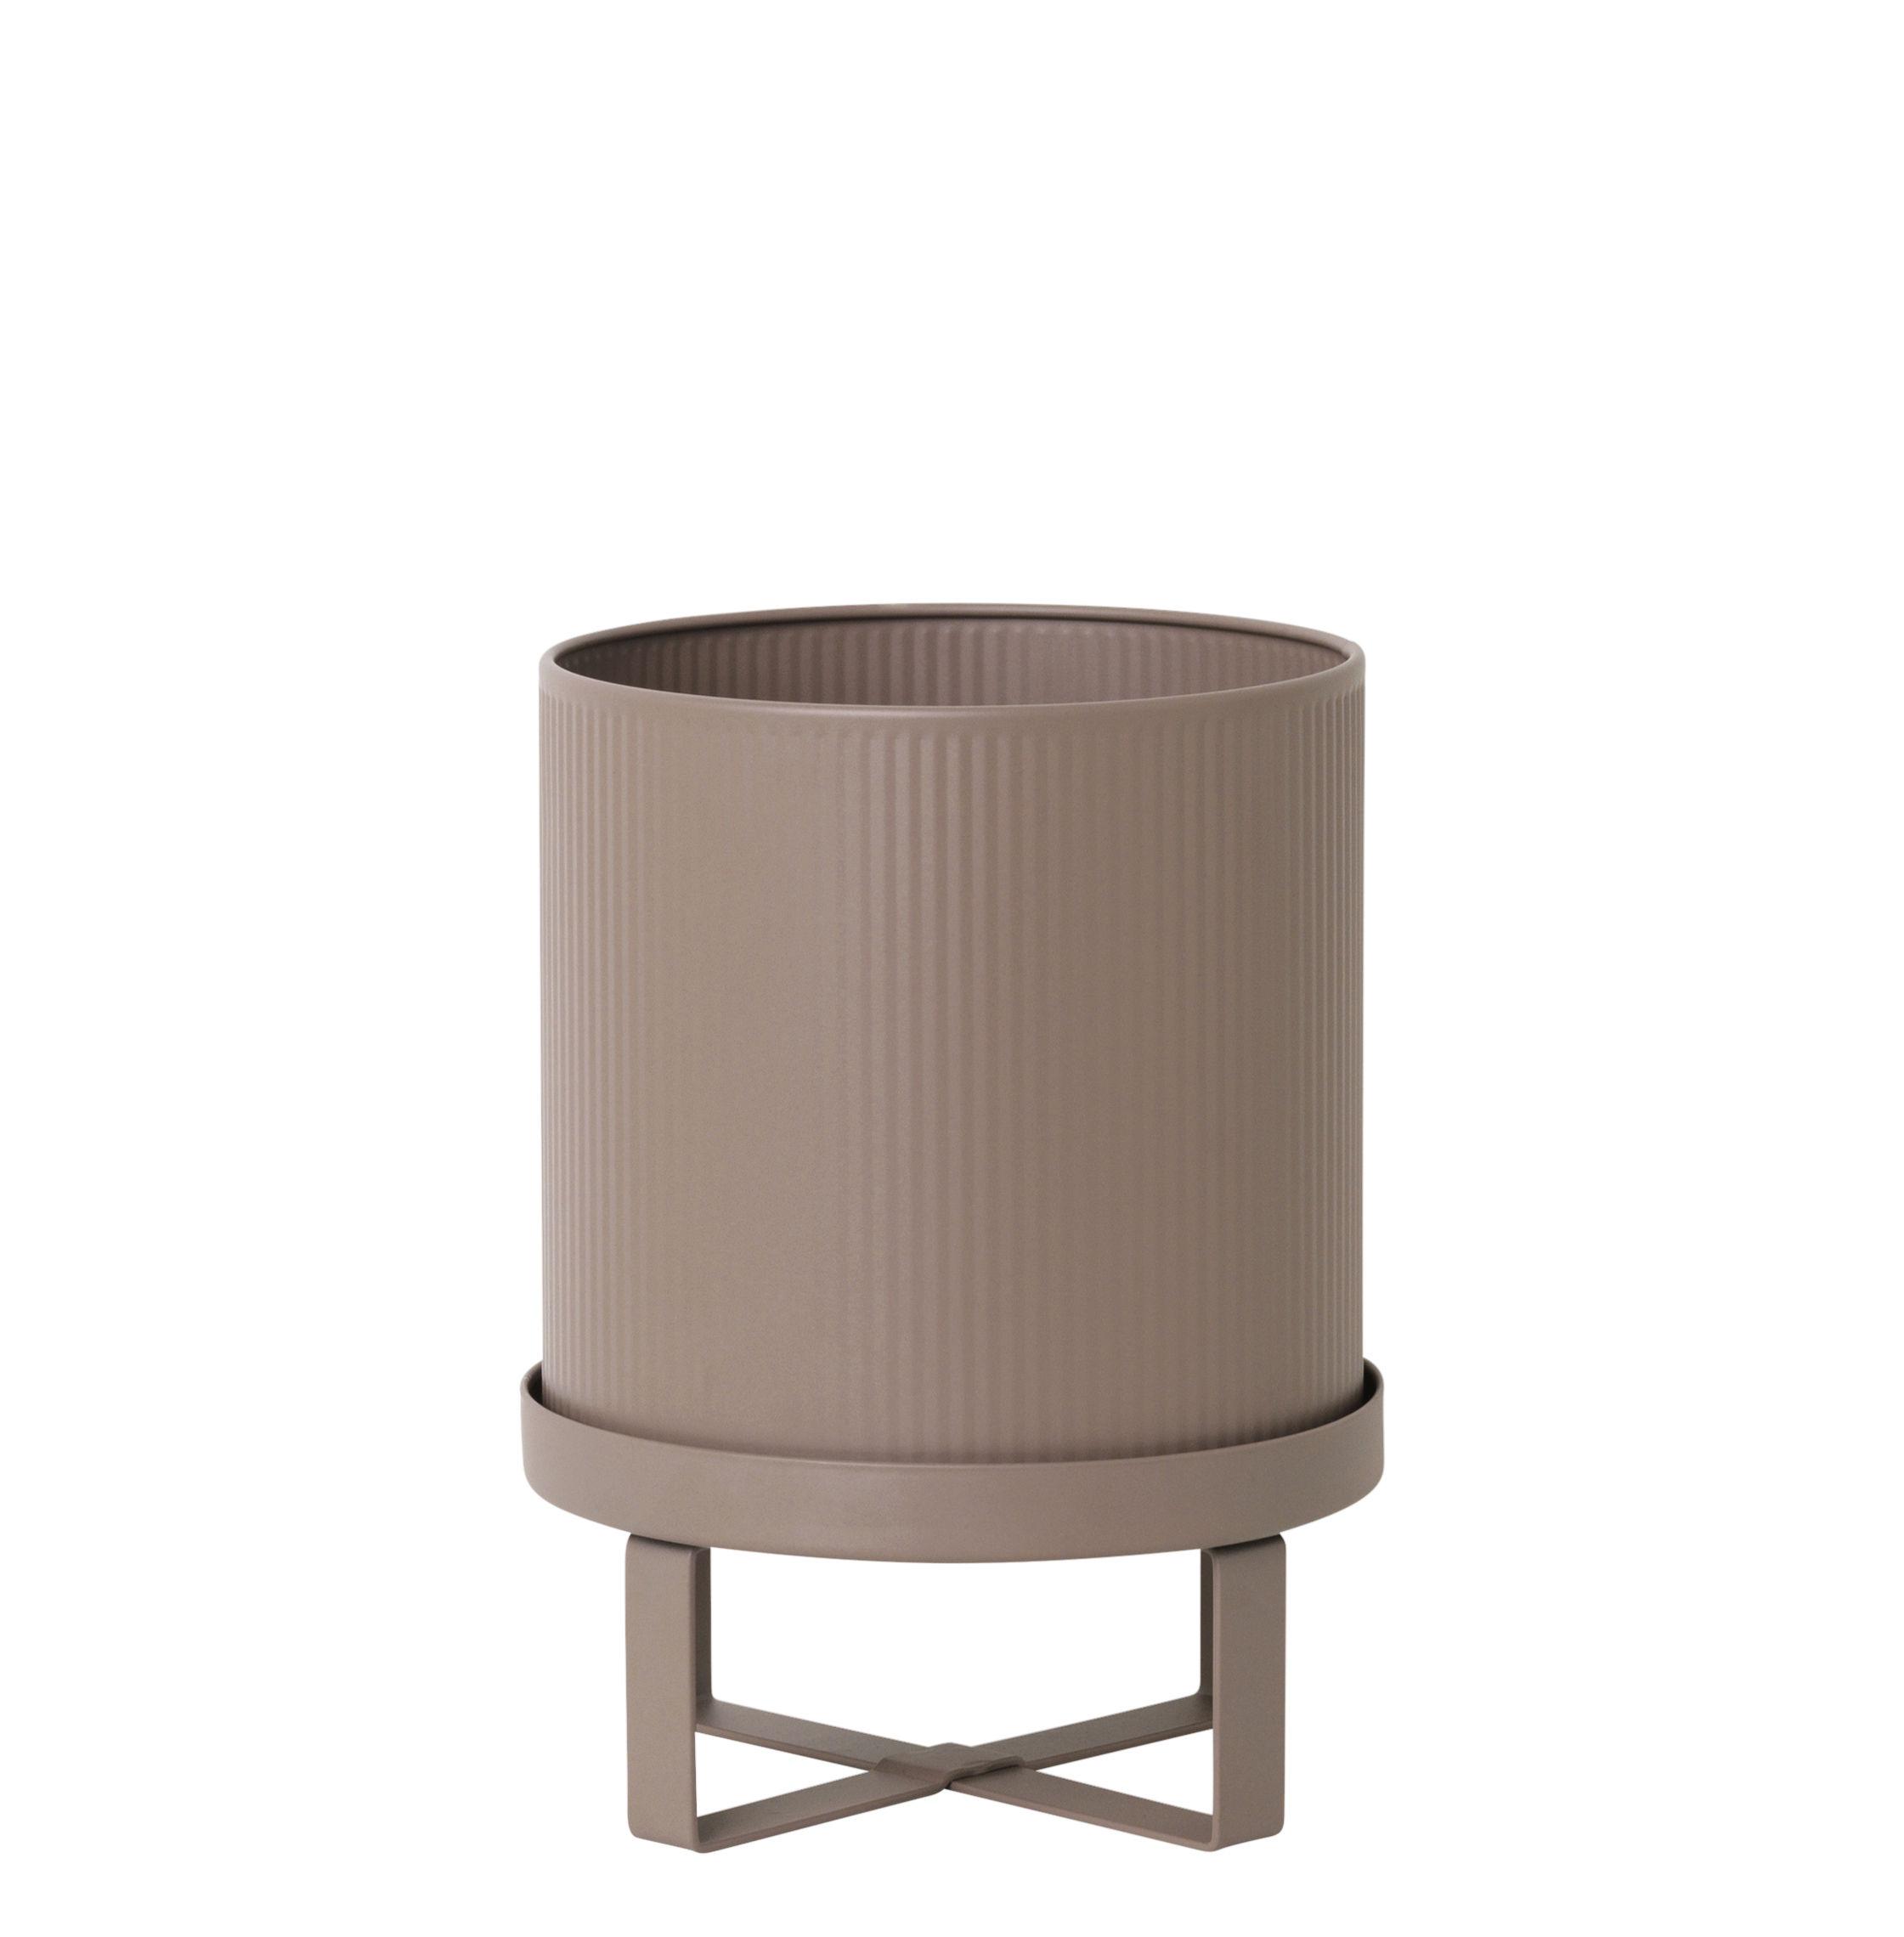 Outdoor - Töpfe und Pflanzen - Bau Small Blumentopf / Ø 18 cm - Metall - Ferm Living - Altrosa - galvanisierter Stahl